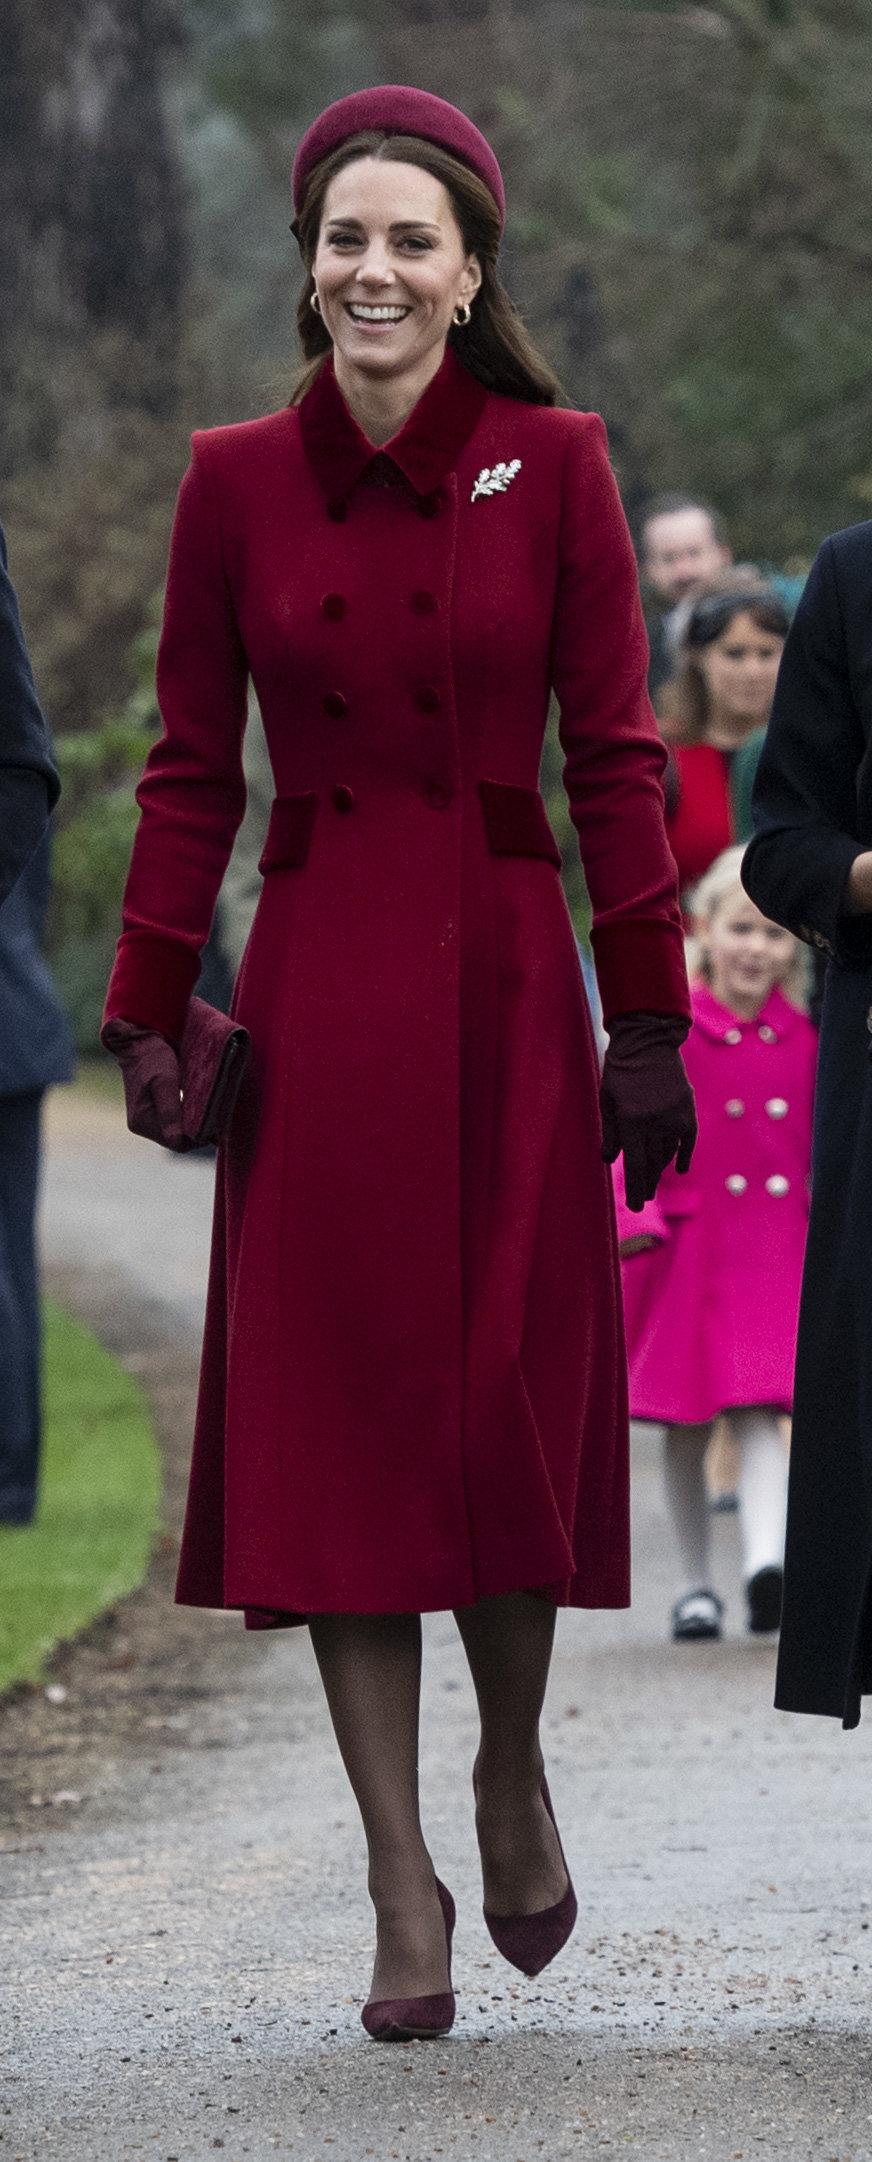 Dianas Butler: Kate hat etwas, dass Lady Di sich immer gewünscht